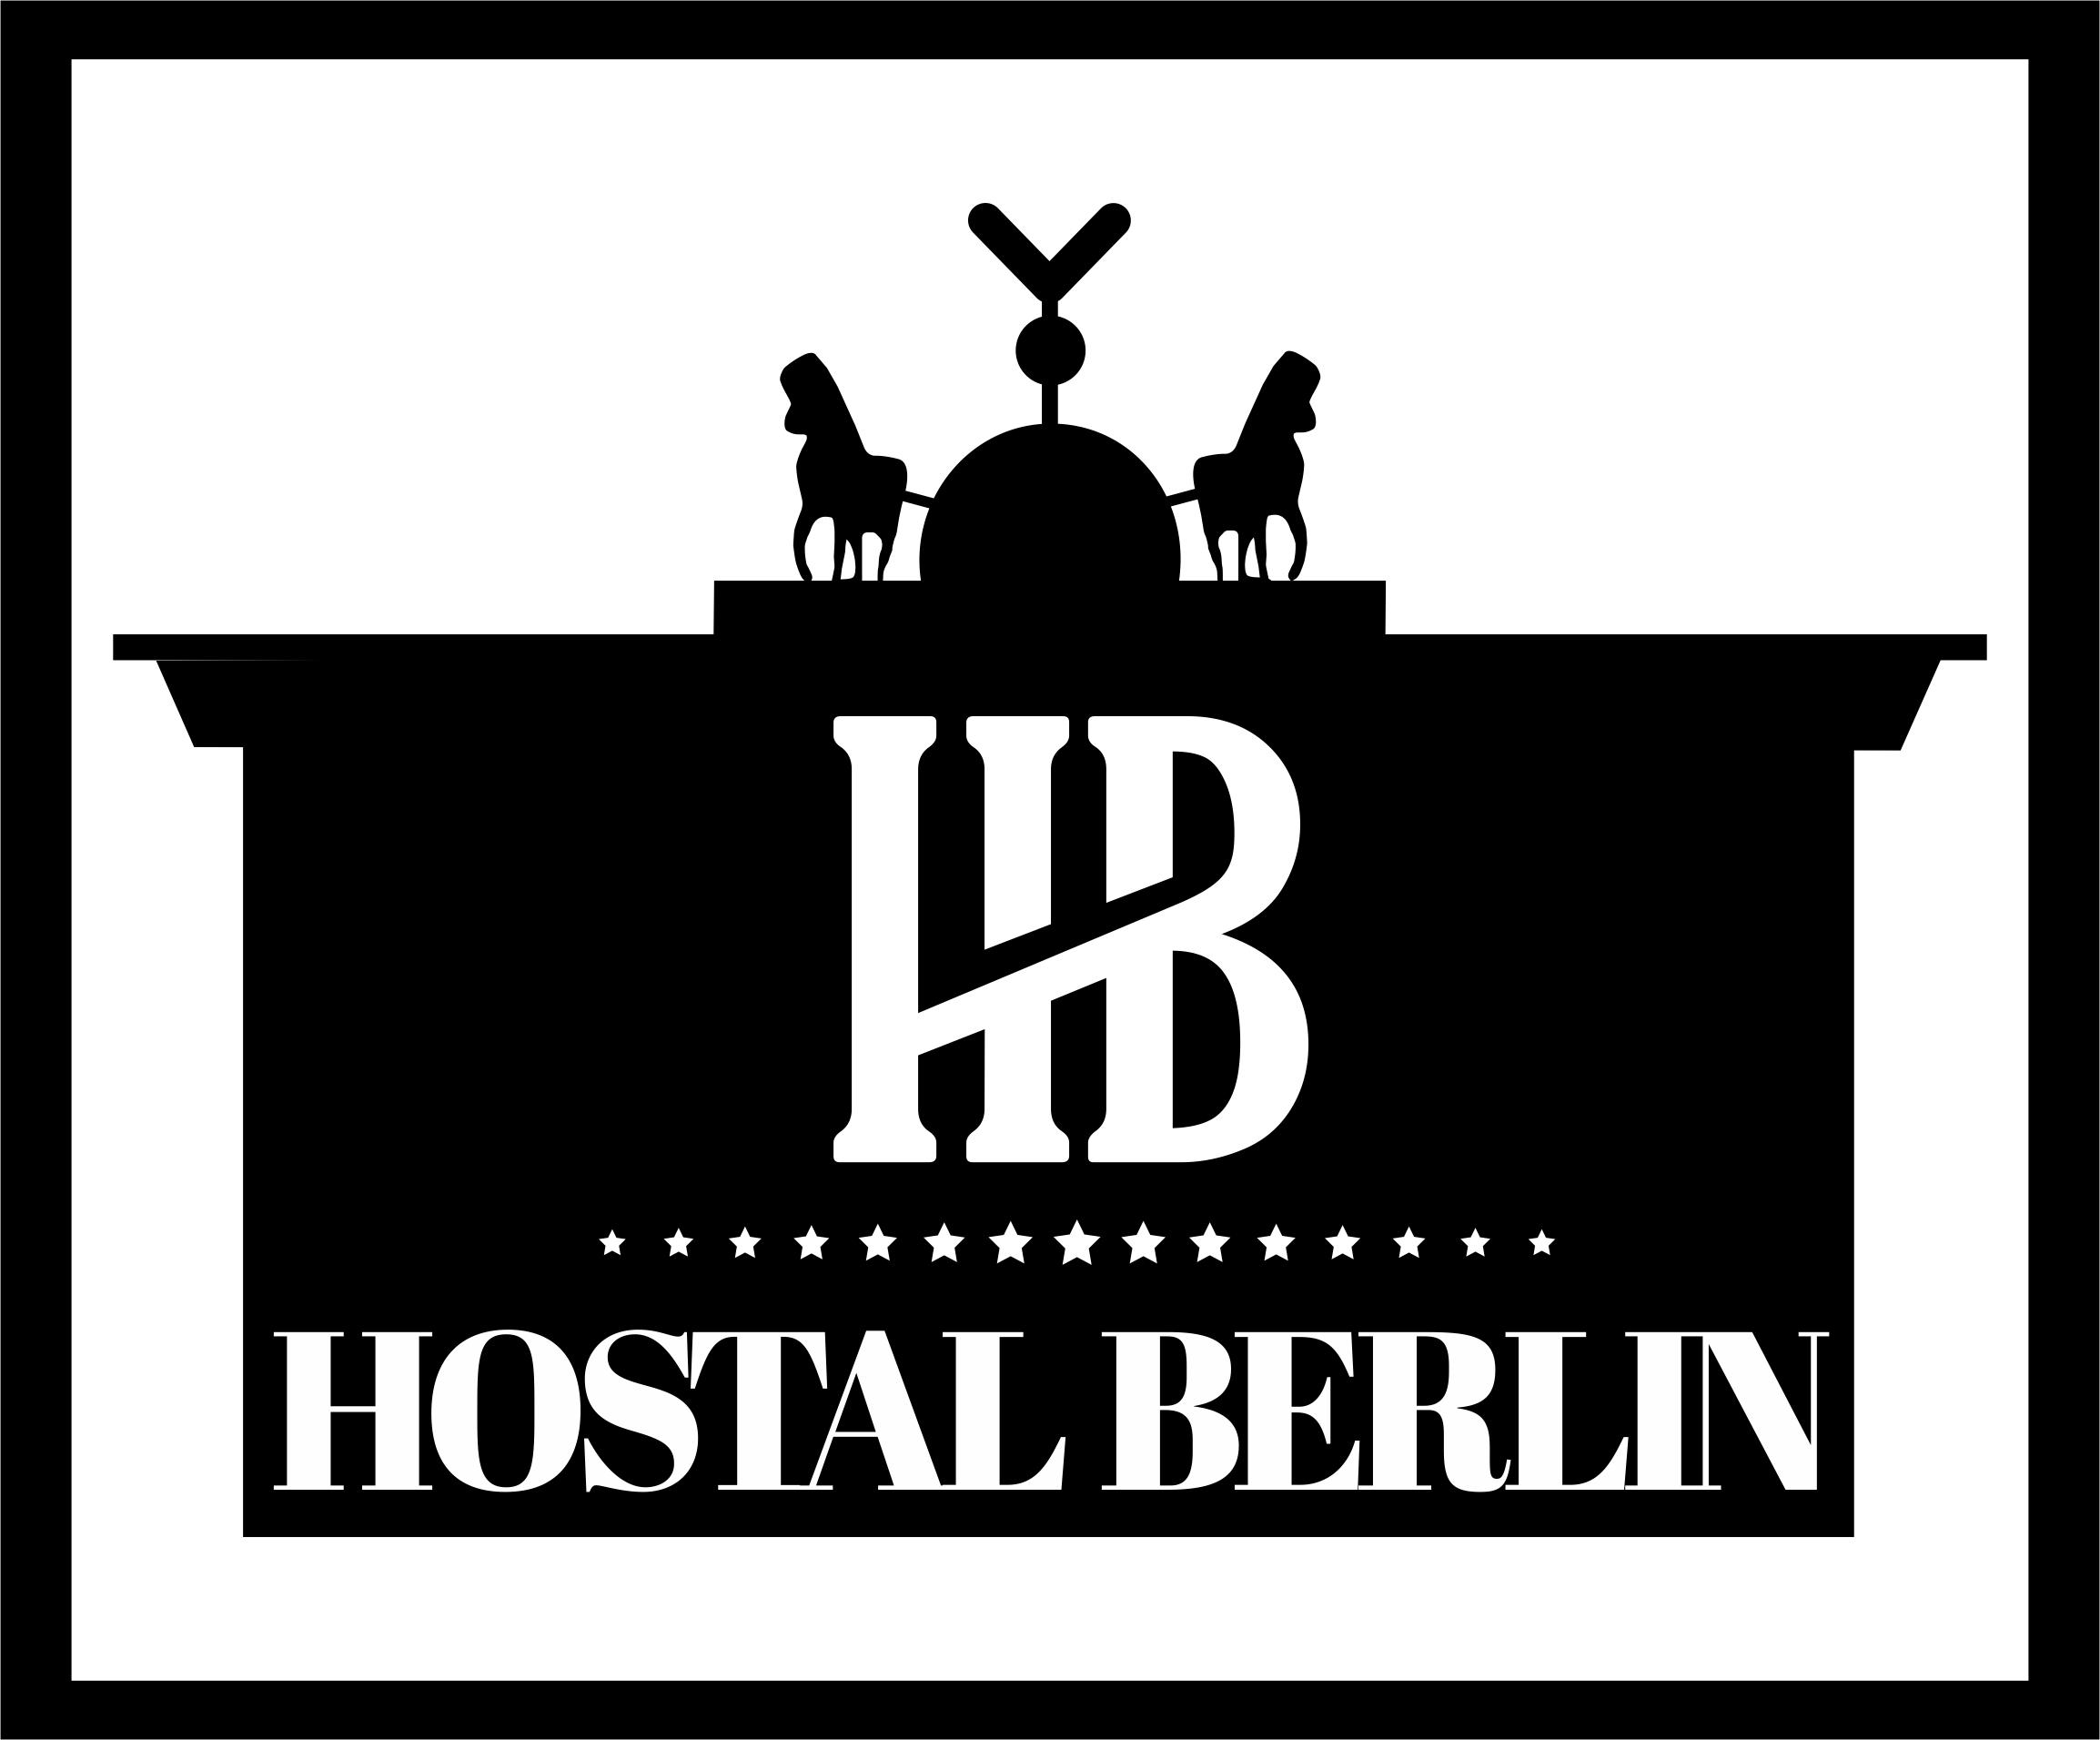 Hostal Berlin